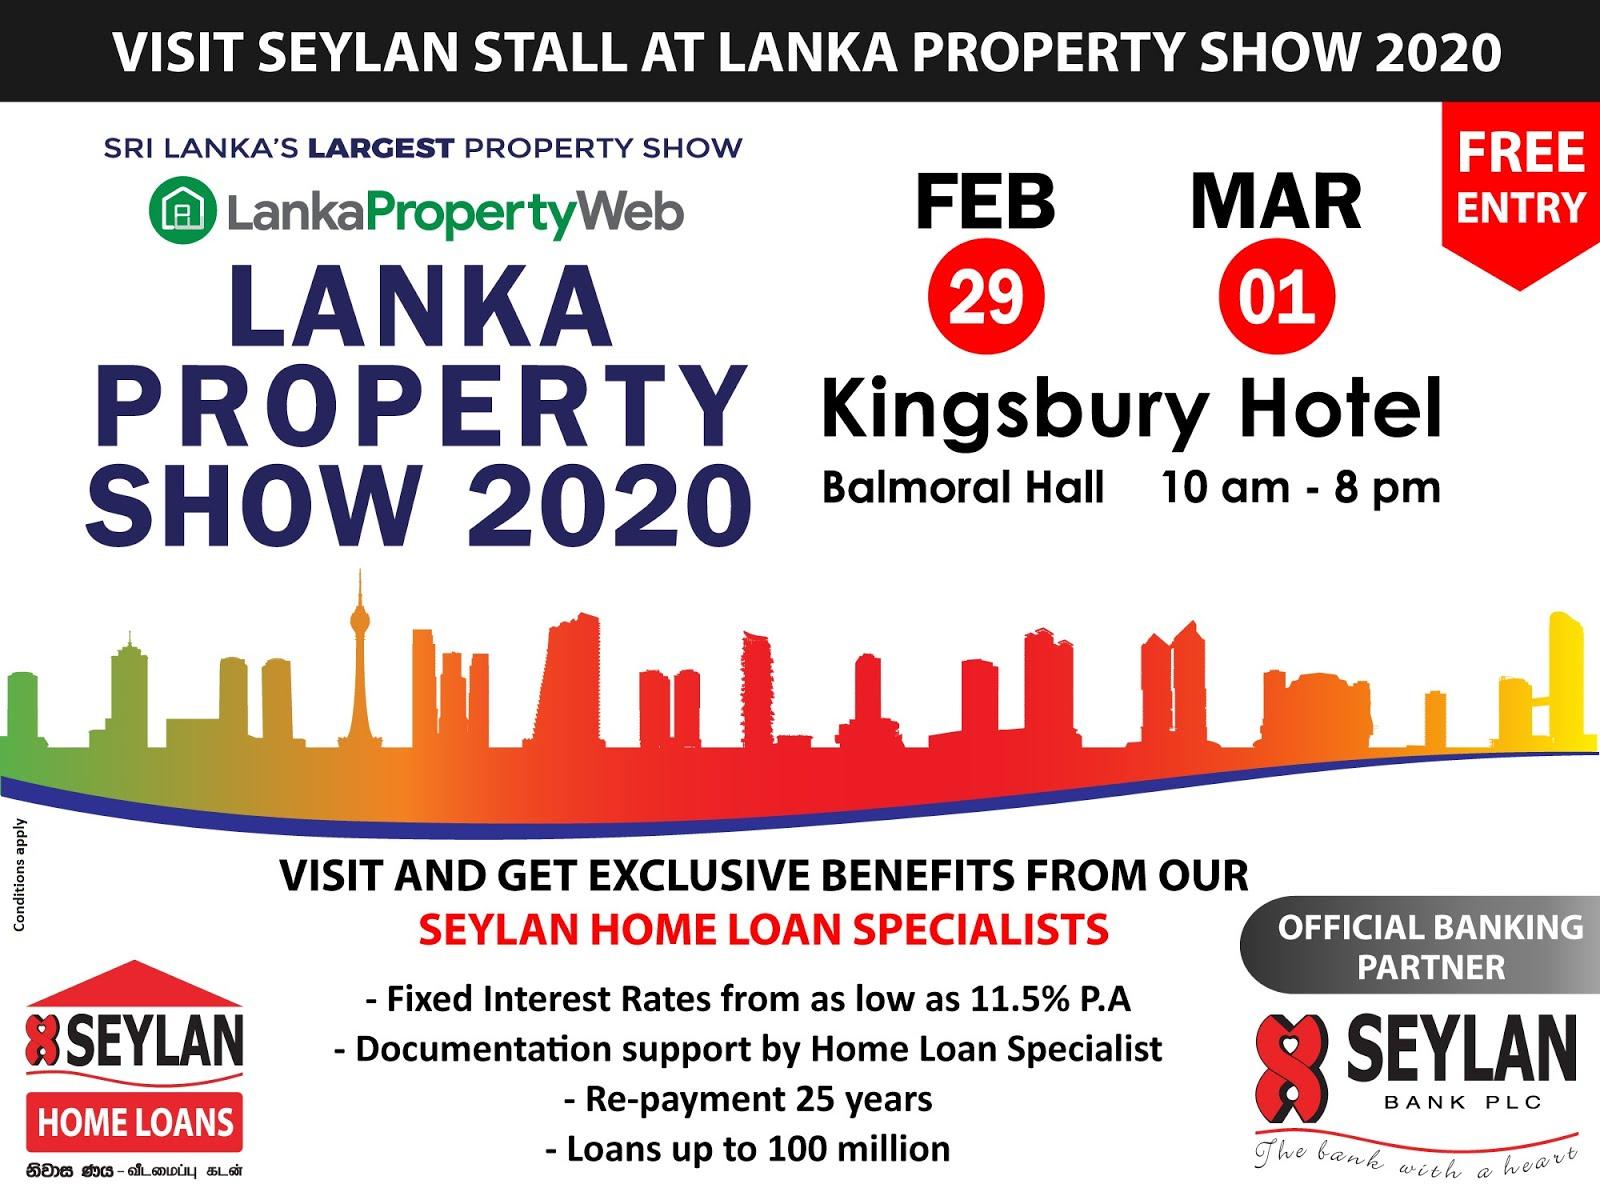 https://www.lankapropertyweb.com/events/